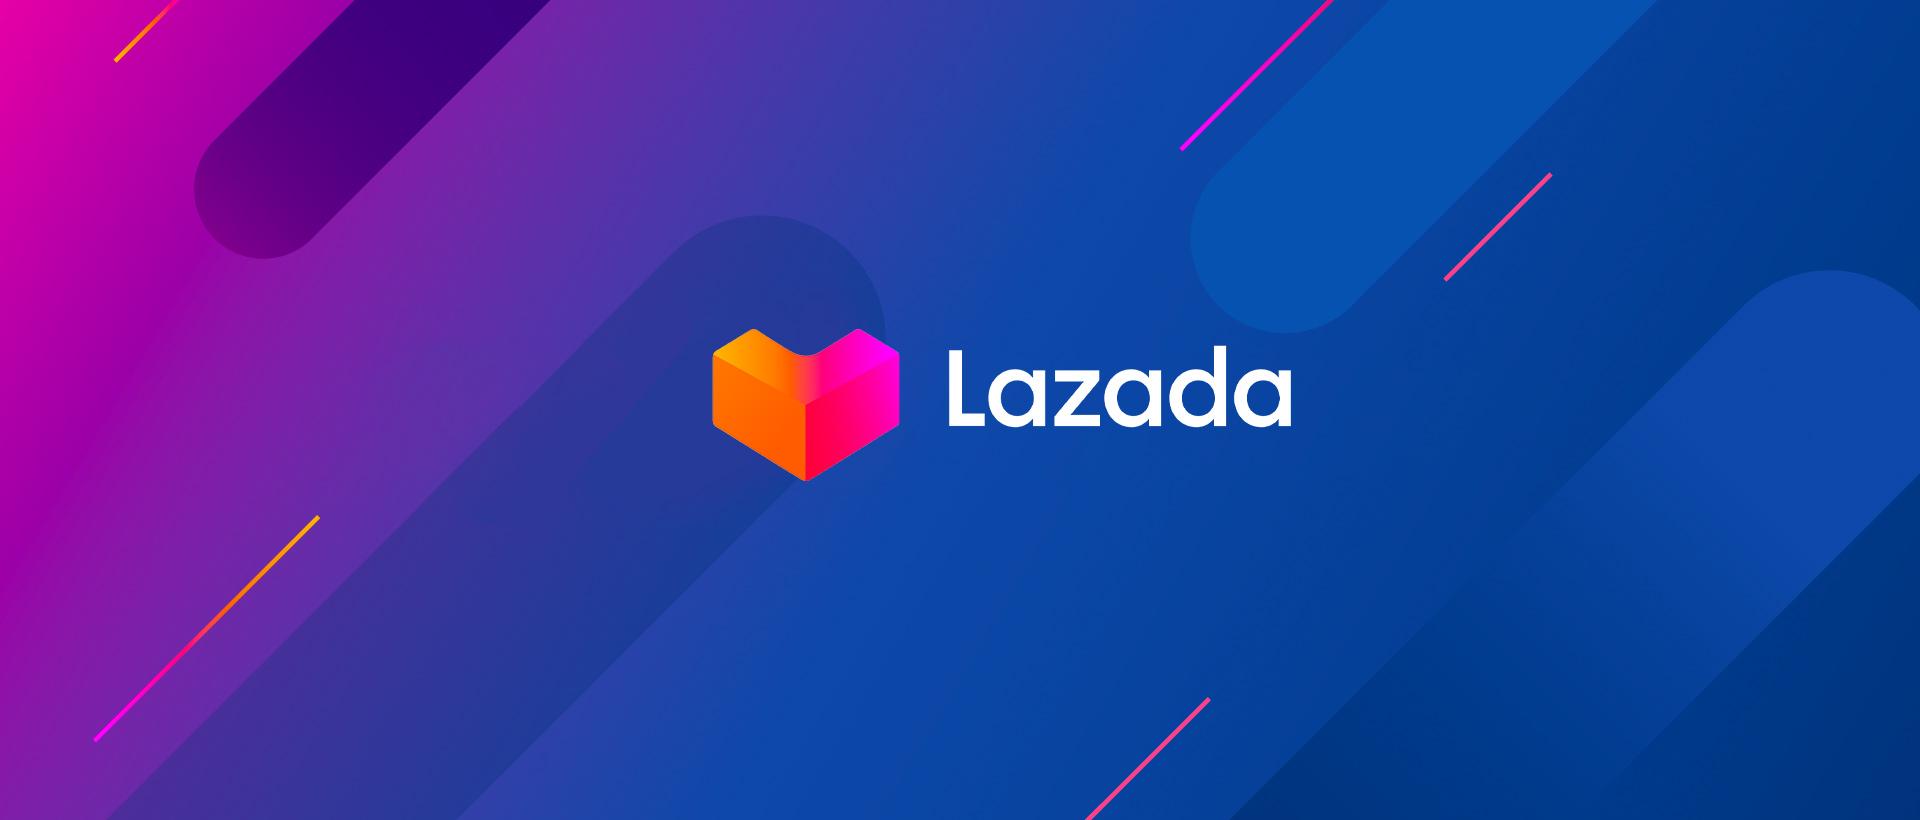 Lazada - แอปช้อปปิ้งสำหรับทุกคน